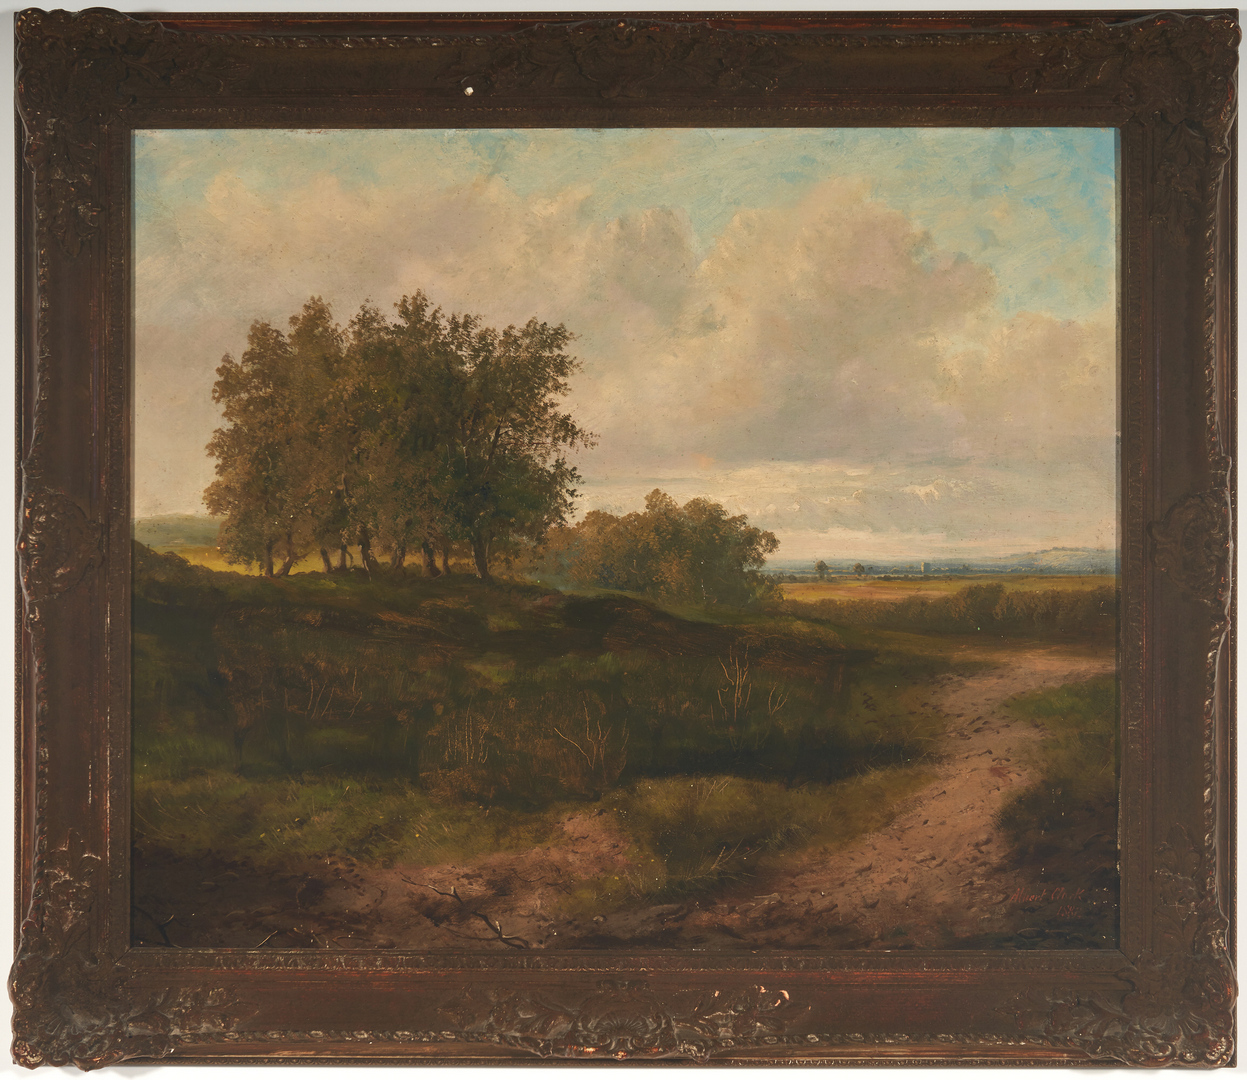 Lot 917: Late 19th century landscape, signed Albert Clark 1882